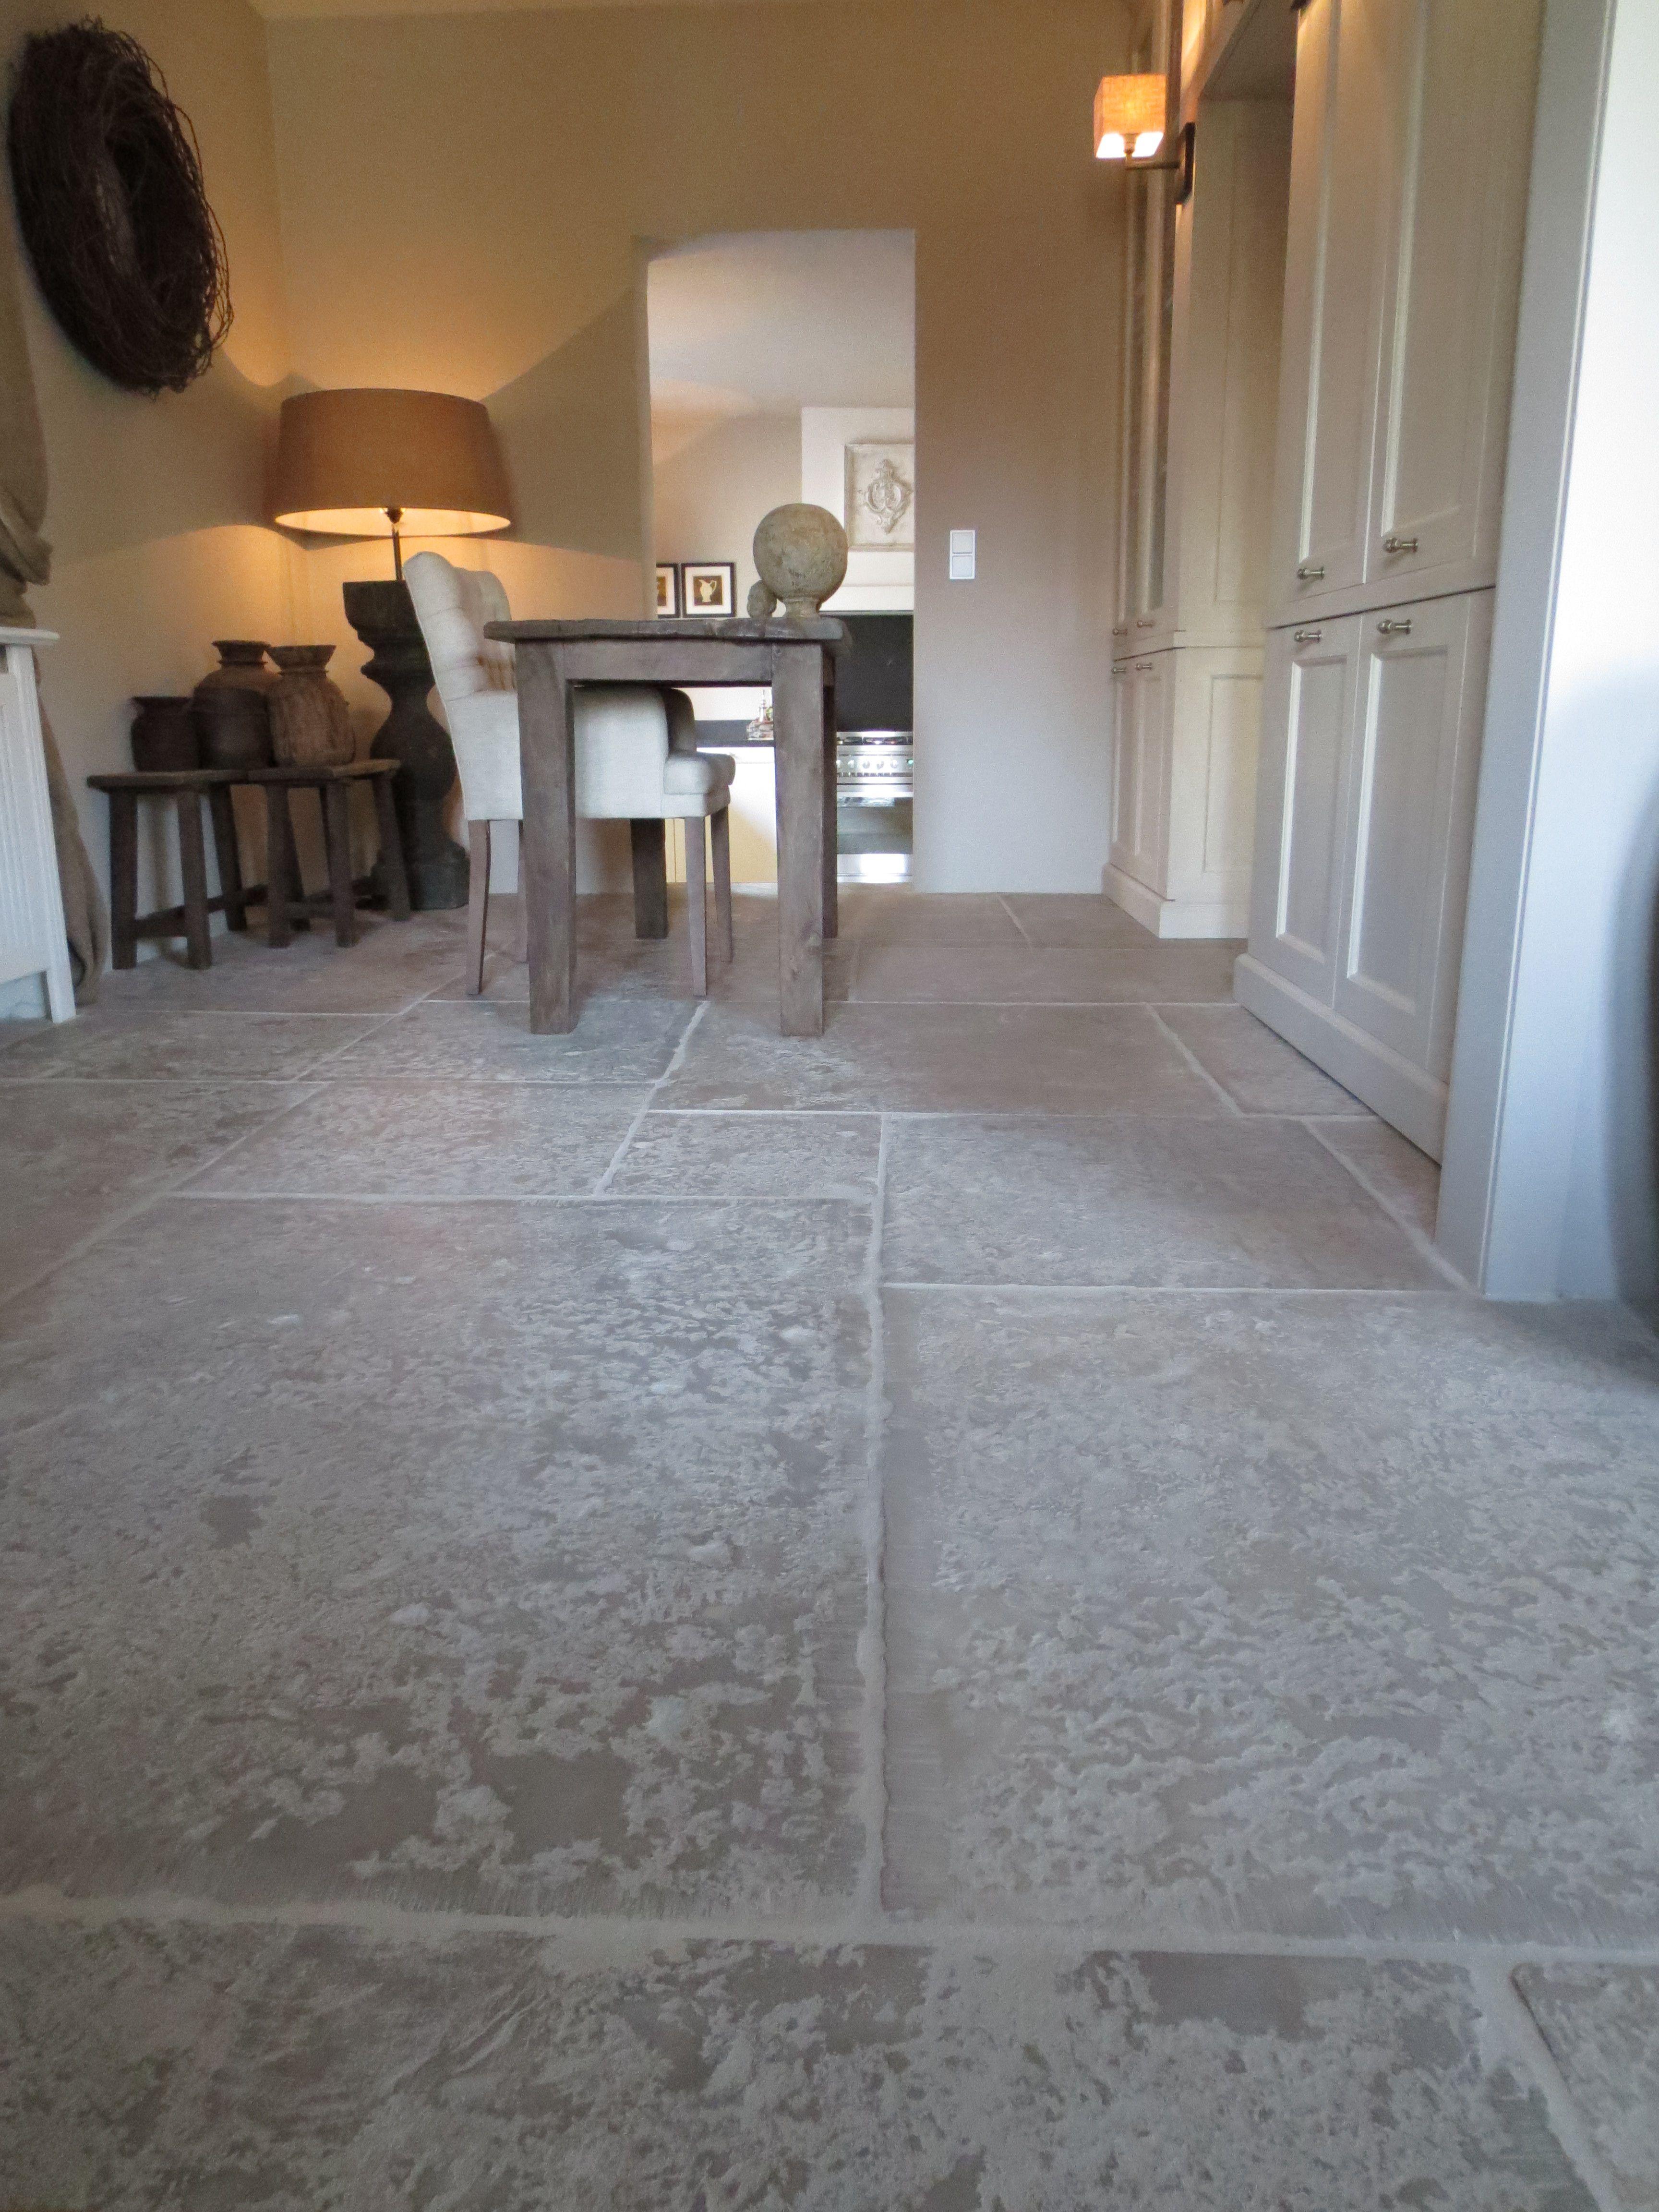 Castle Stones Loft Diningroom Floor Available: http://www.eisinga ...